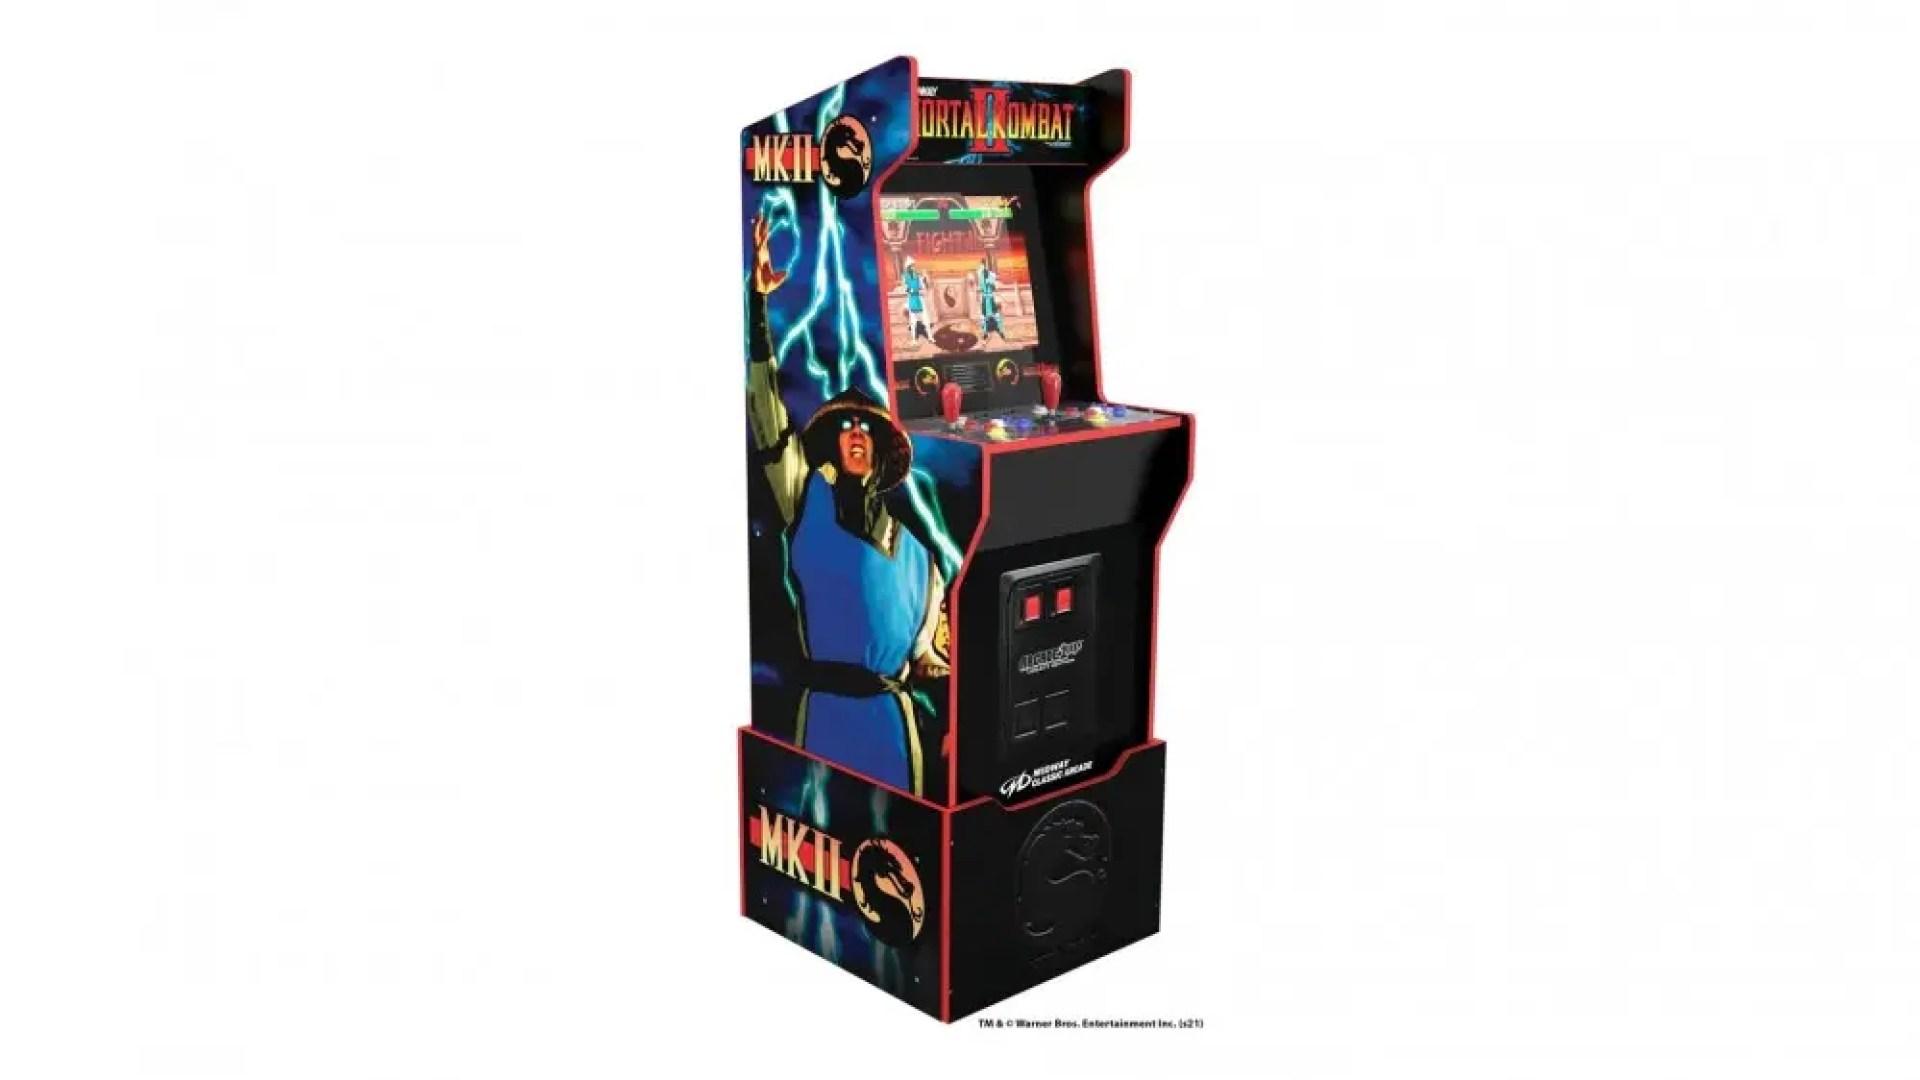 The 'Mortal Kombat' machine, showing faux coin slots.